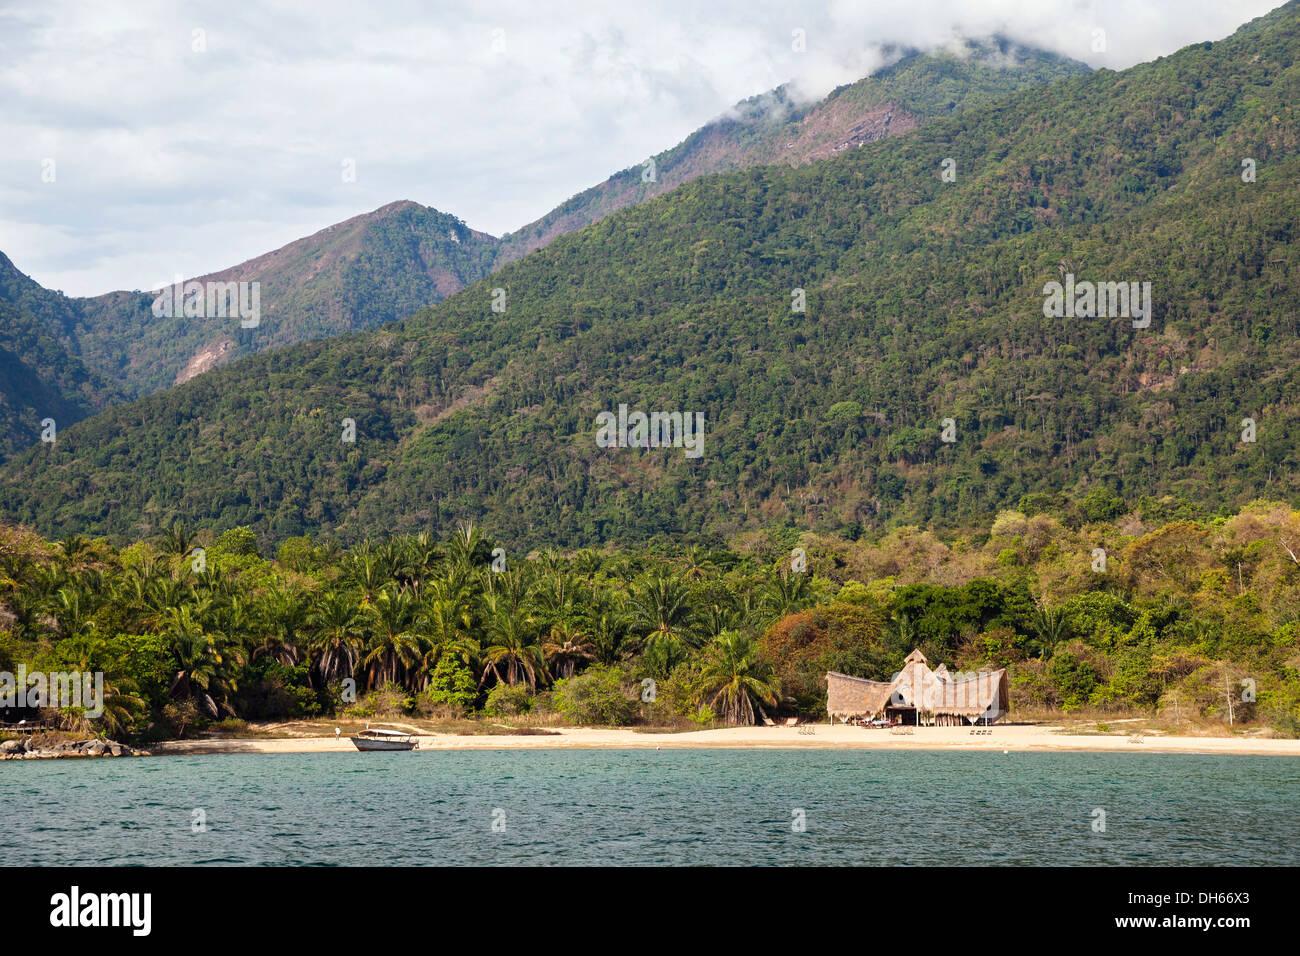 Nomad camp on Lake Tanganyika, Mahale Mountains Nationalpark, Tansania, Tanzania - Stock Image